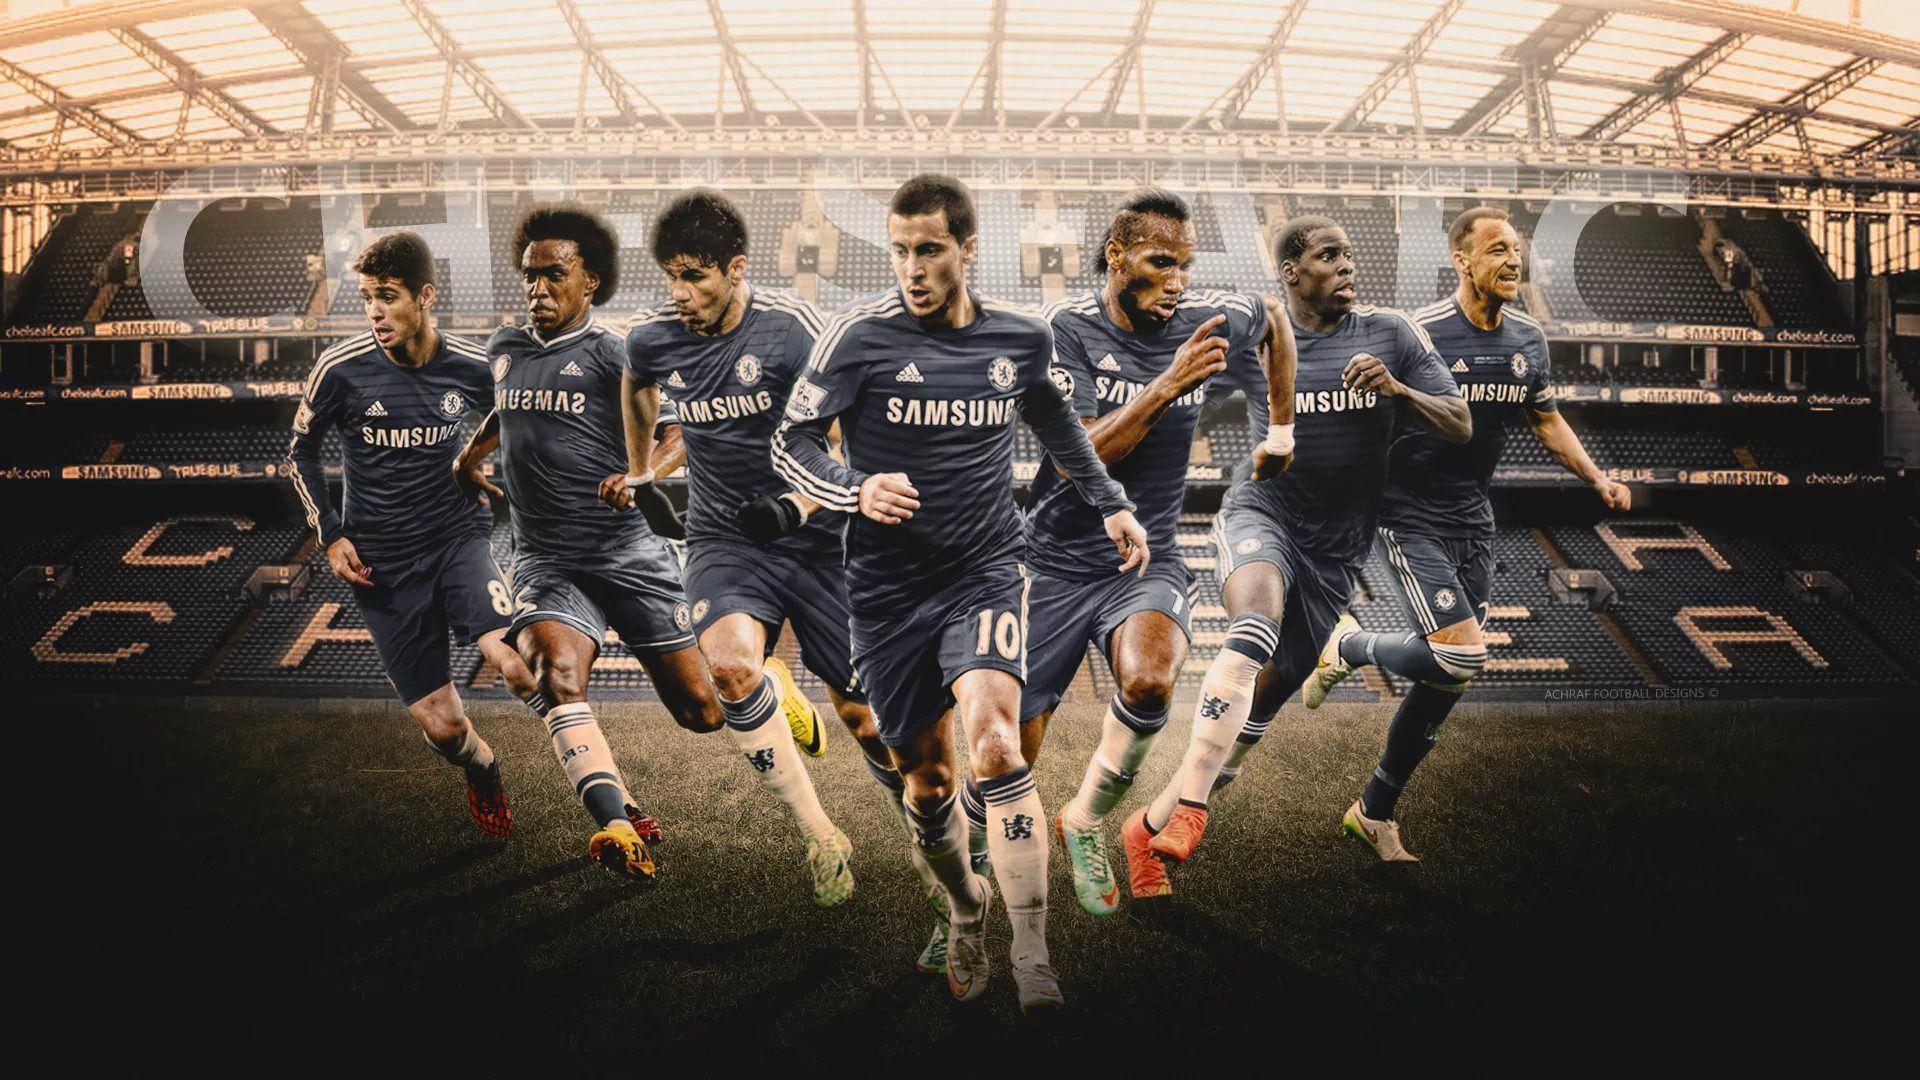 Chelsea screen wallpaper